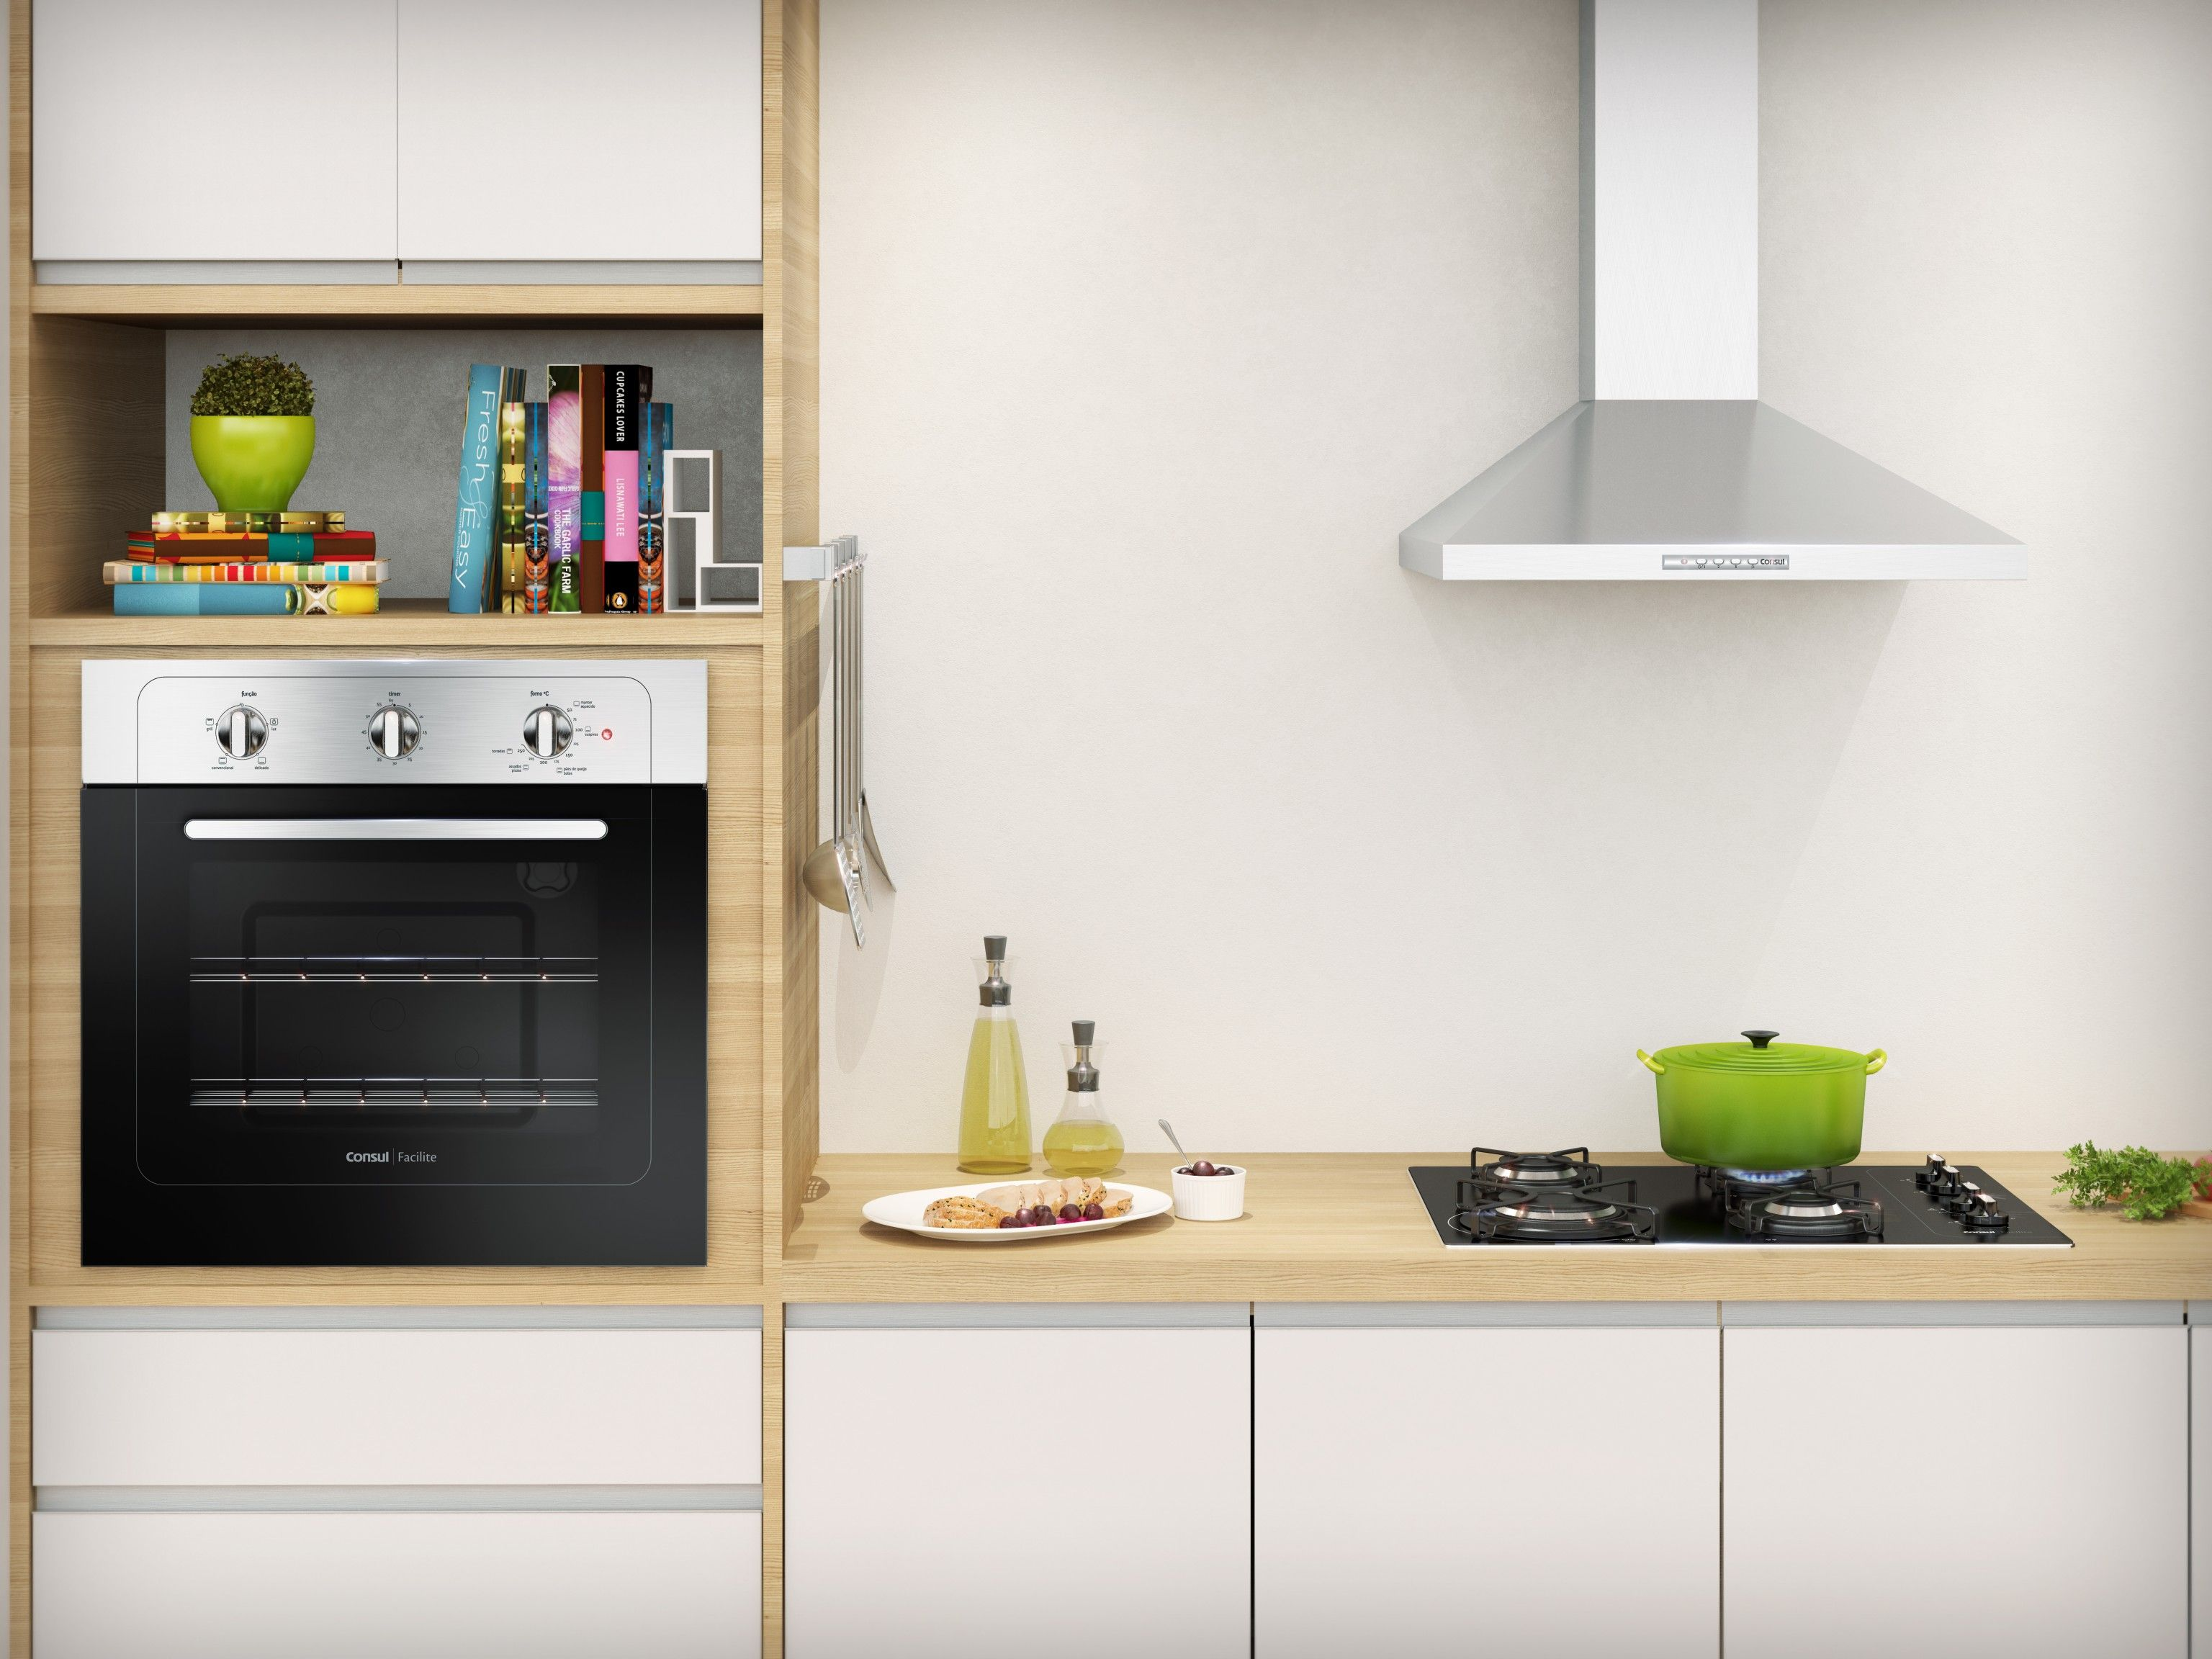 Cozinha Completa Consul Cooktop Coifa E Forno De Embutir Sua Casa